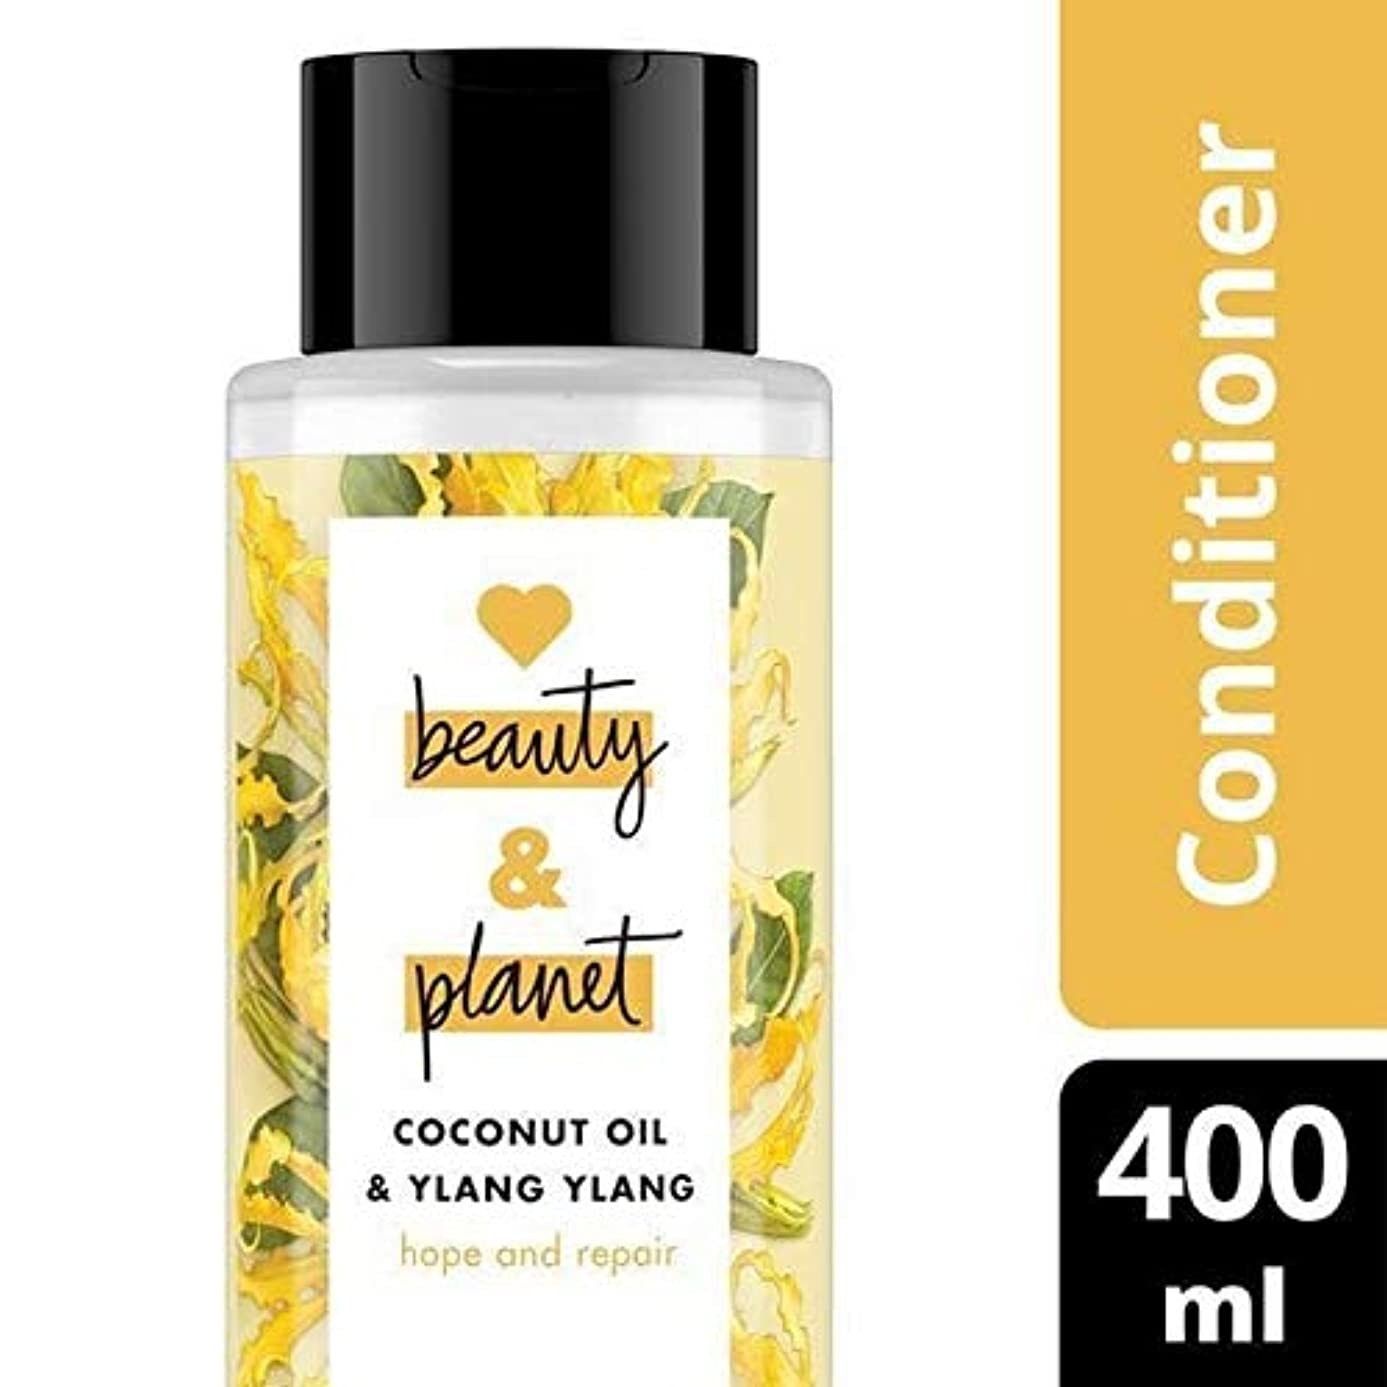 [Love Beauty and Planet ] 美しさと地球の希望&リペアコンディショナーを愛します - Love Beauty And Planet Hope & Repair Conditioner [並行輸入品]